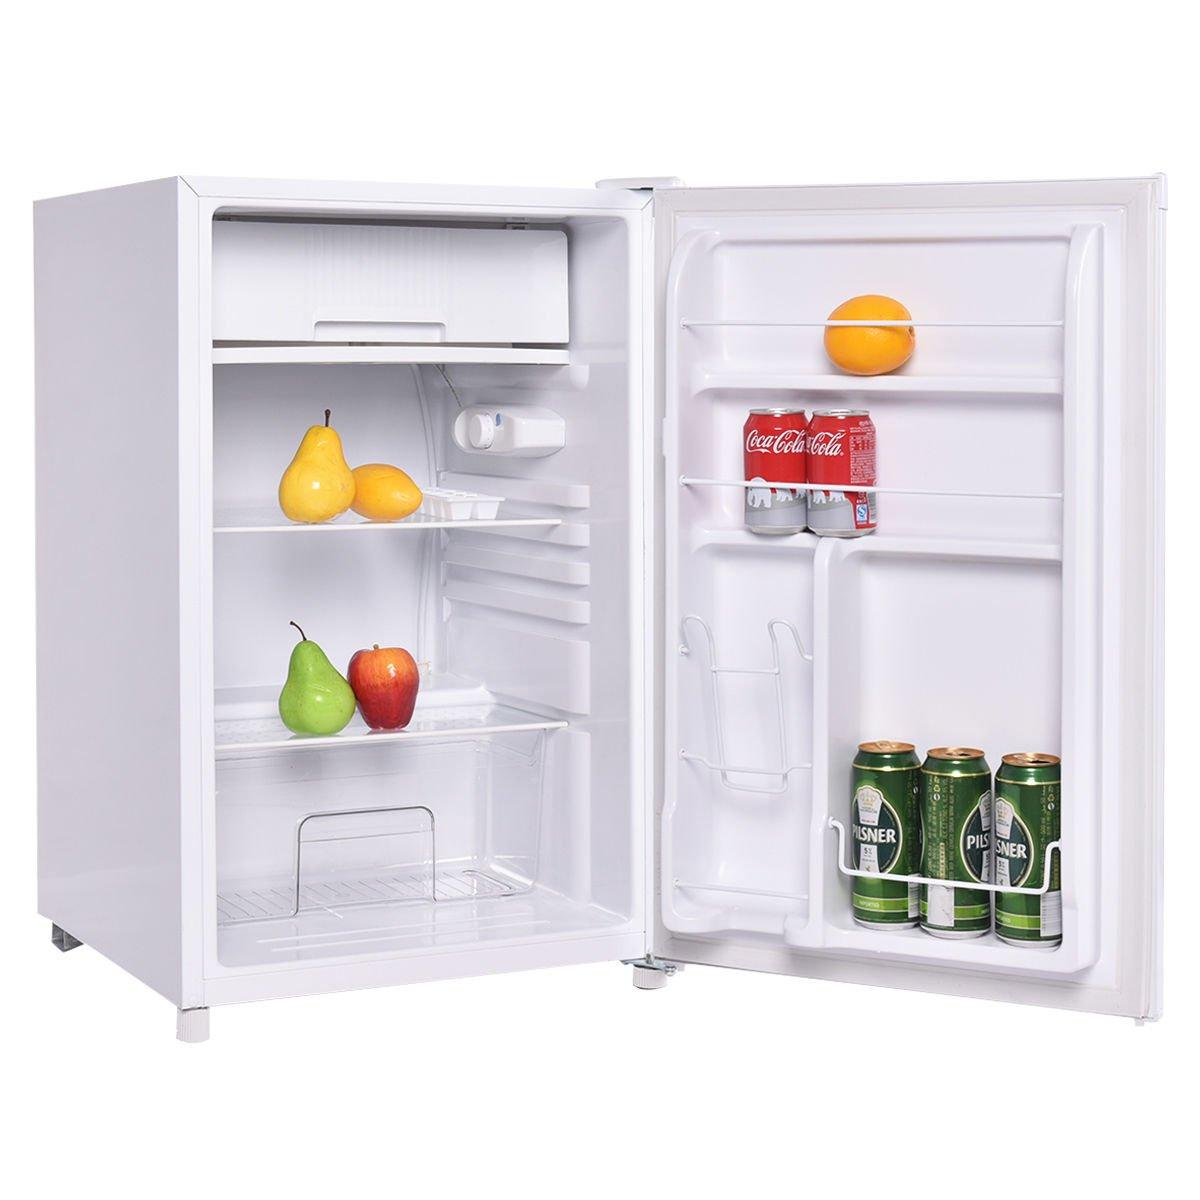 Compact fridges